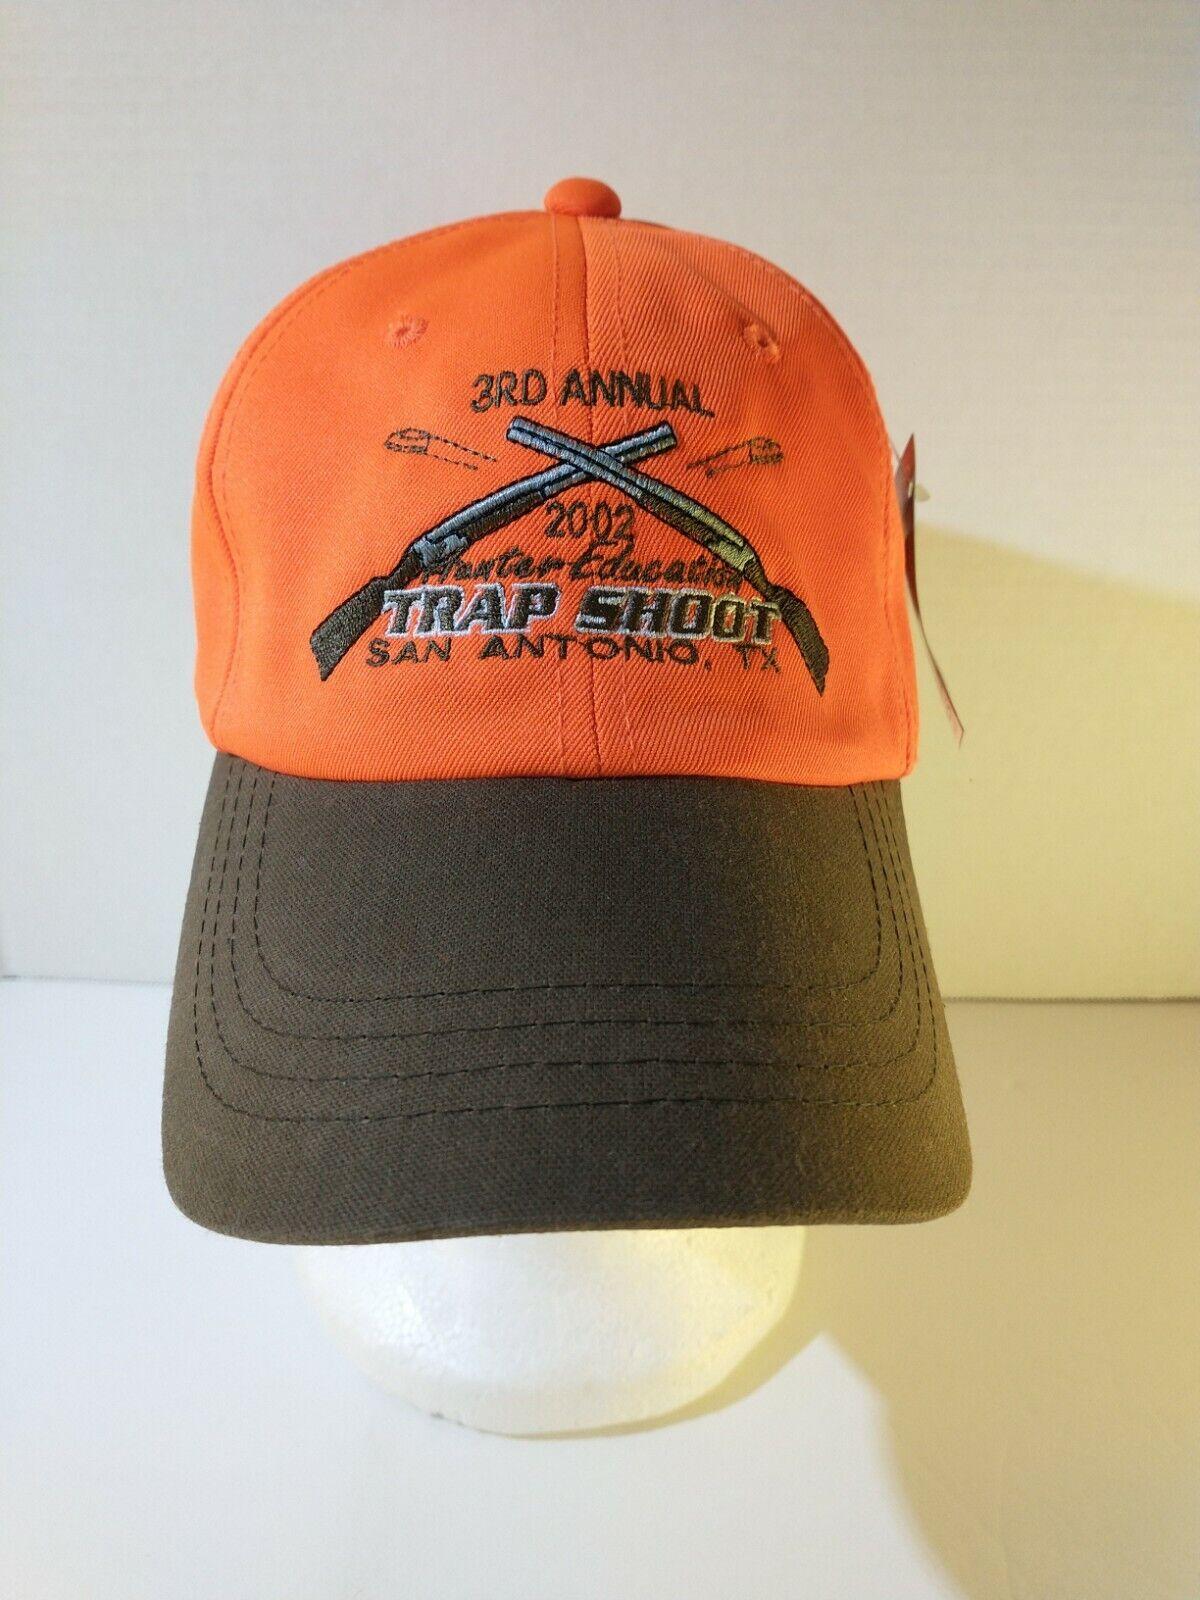 Texas Wildlife Resource Agency Hunter Education 2002 Trap Shoot Hat Blaze Orange